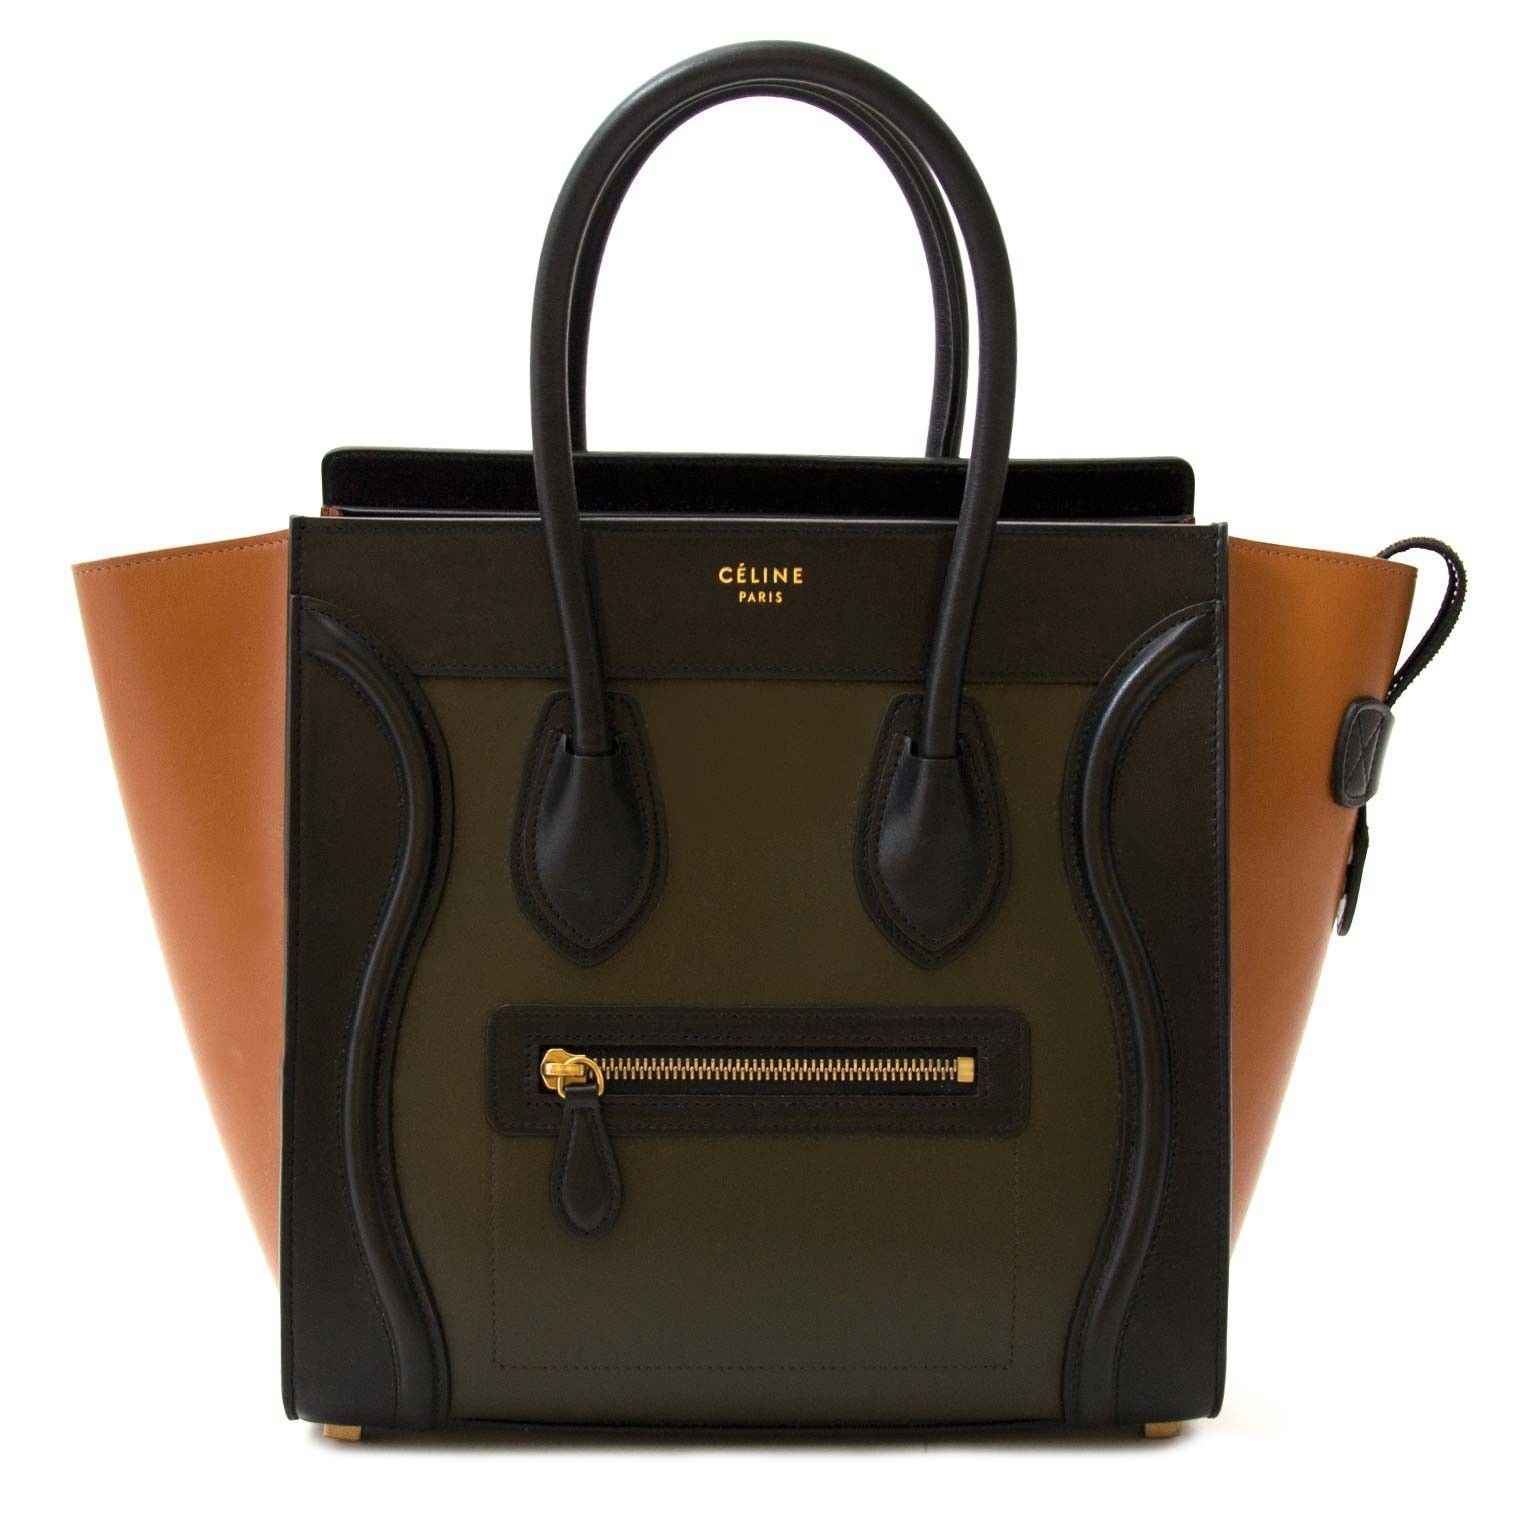 a23eb7e2b64fa Chicnova fashion 1   amazing   Fashion, Polyvore, Celine luggage